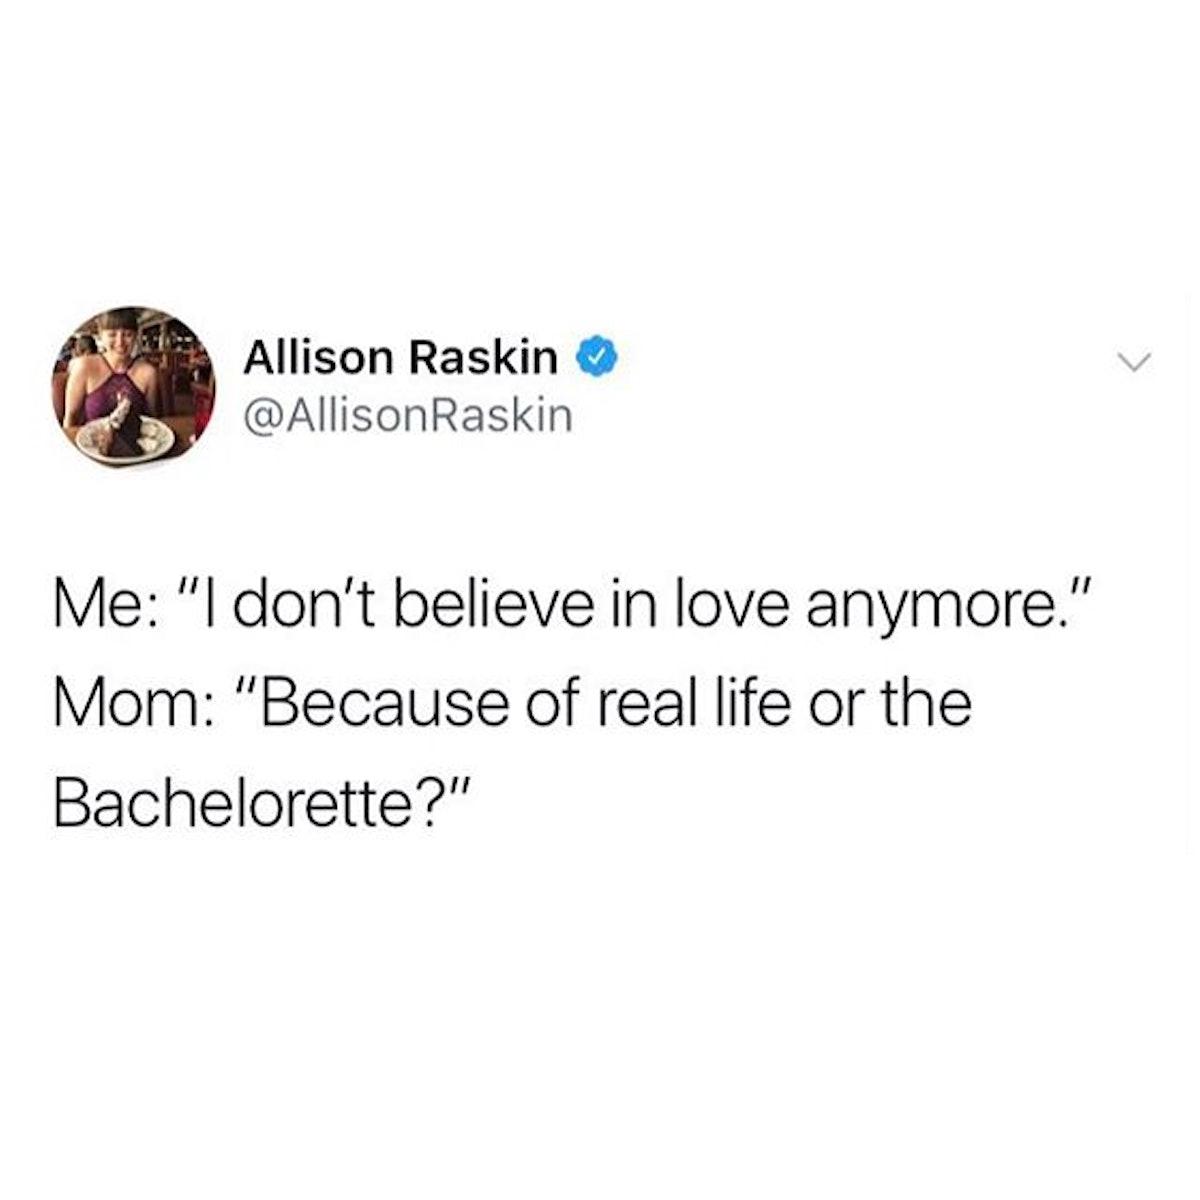 Meme over relationship is Friendship ended